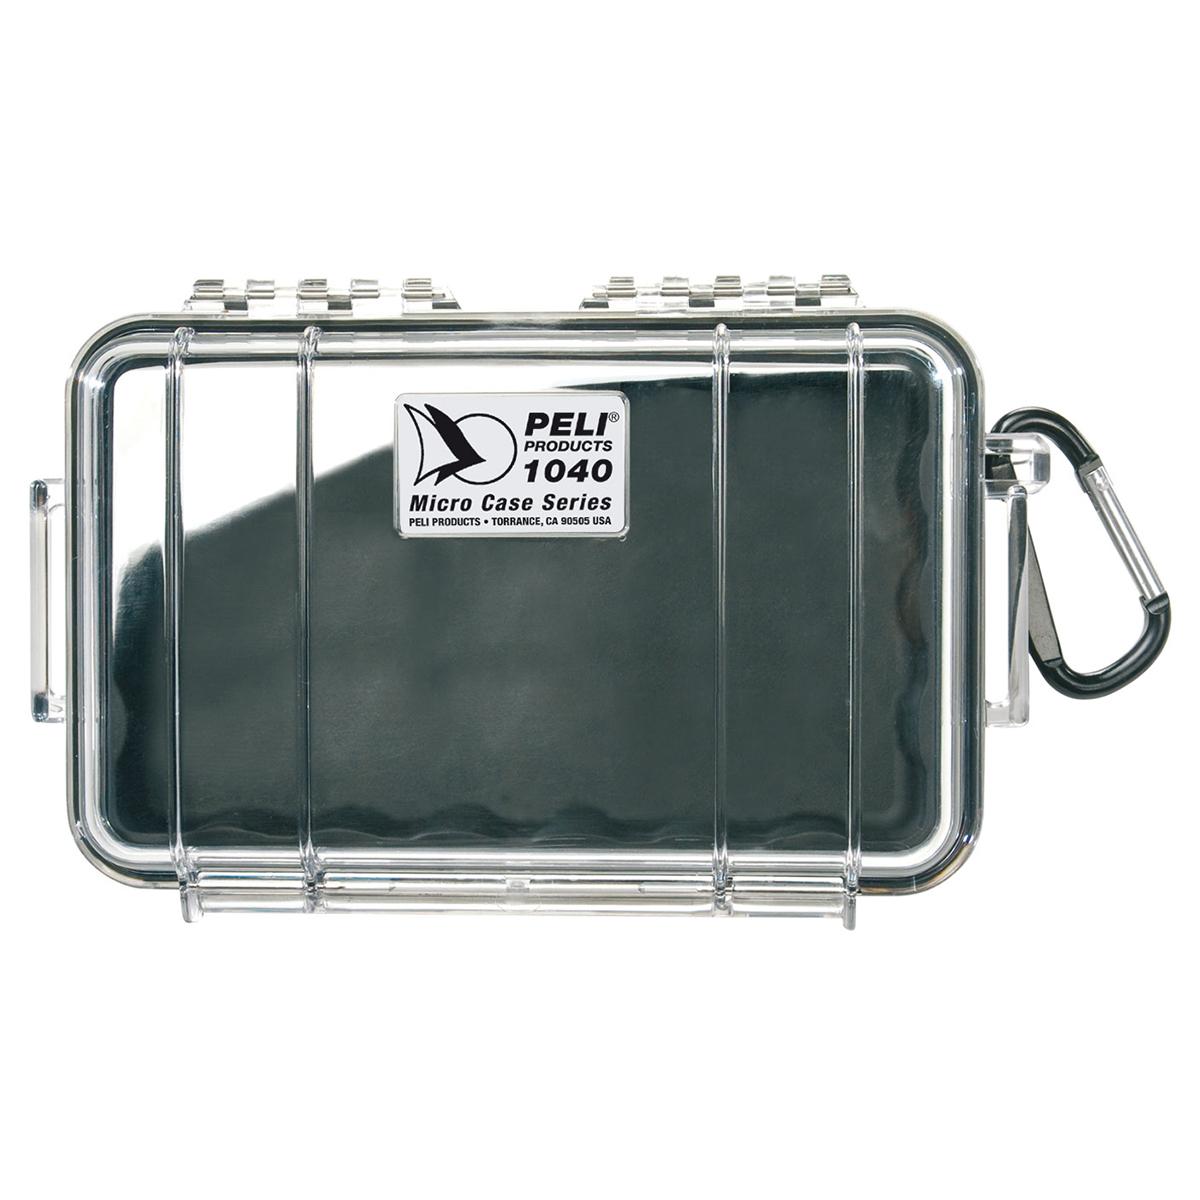 Peli Case 1040 Micro Transparant / Zwart